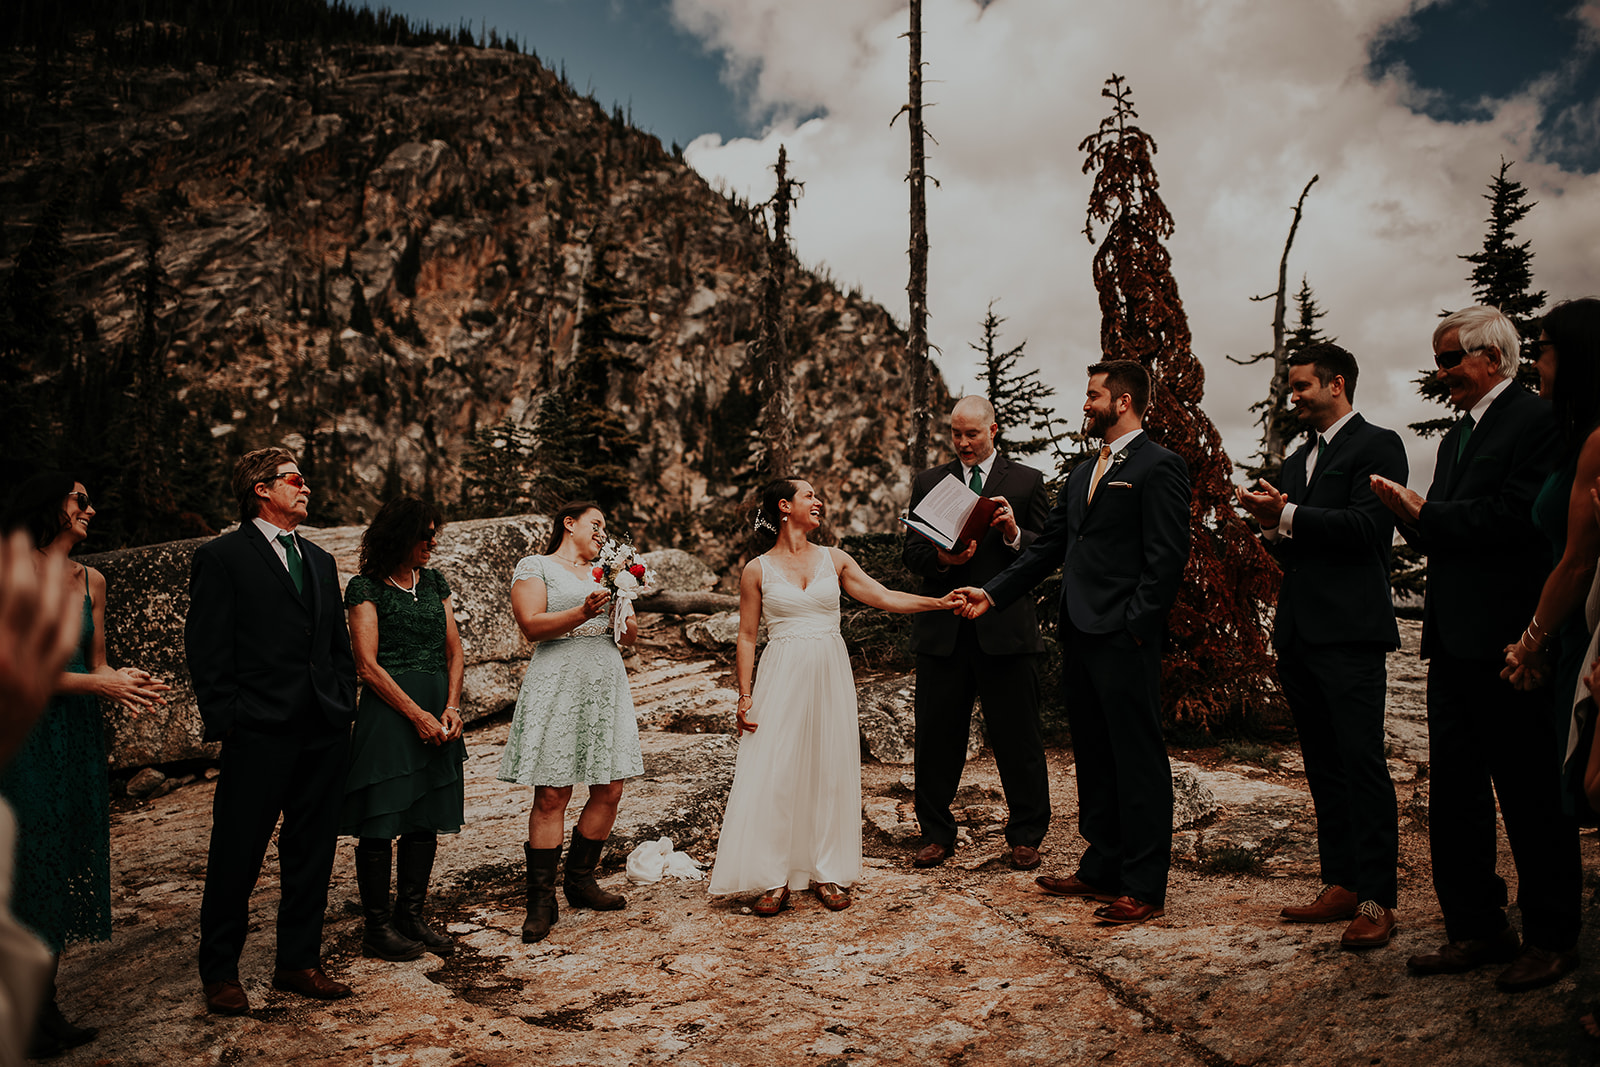 winthrop-wedding-photographer-megan-gallagher-photography (18).jpg